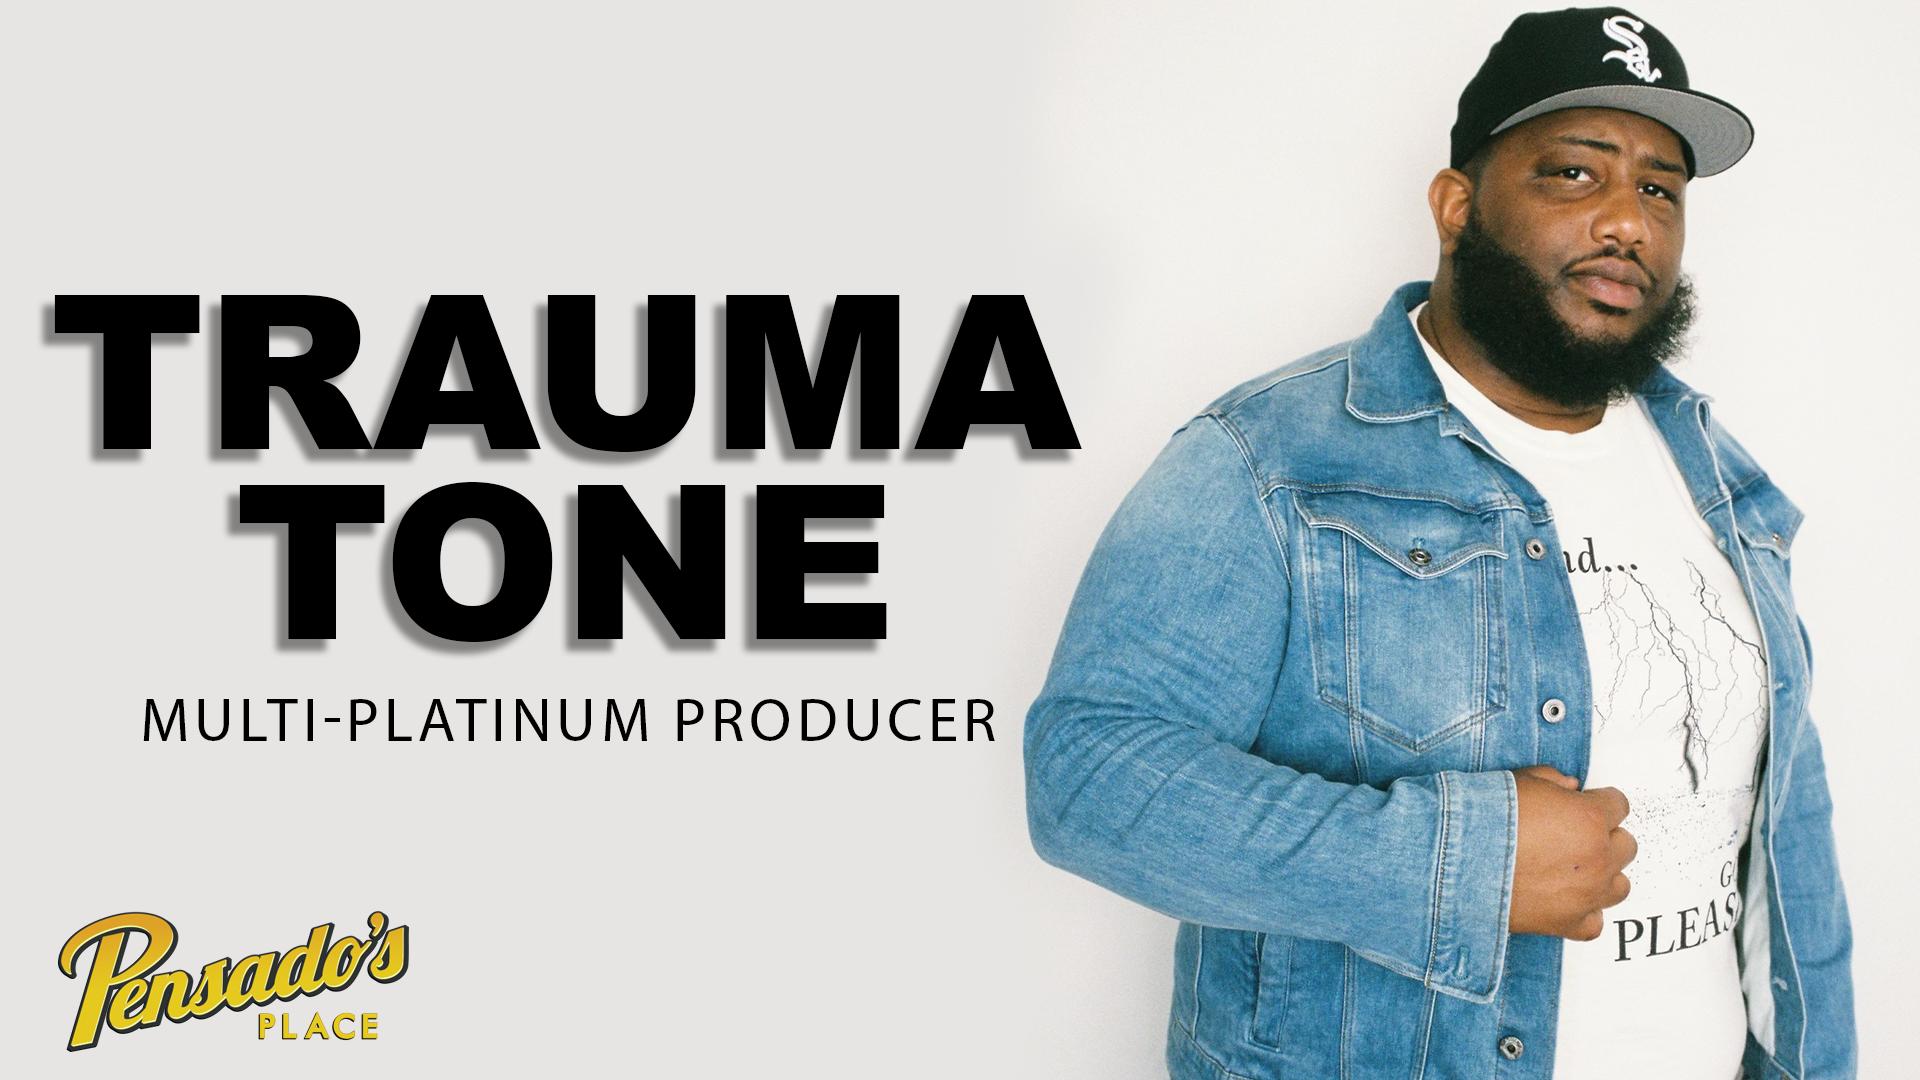 Multi-Platinum Producer, Trauma Tone (Migos, Chief Keef, Kevin Gates)